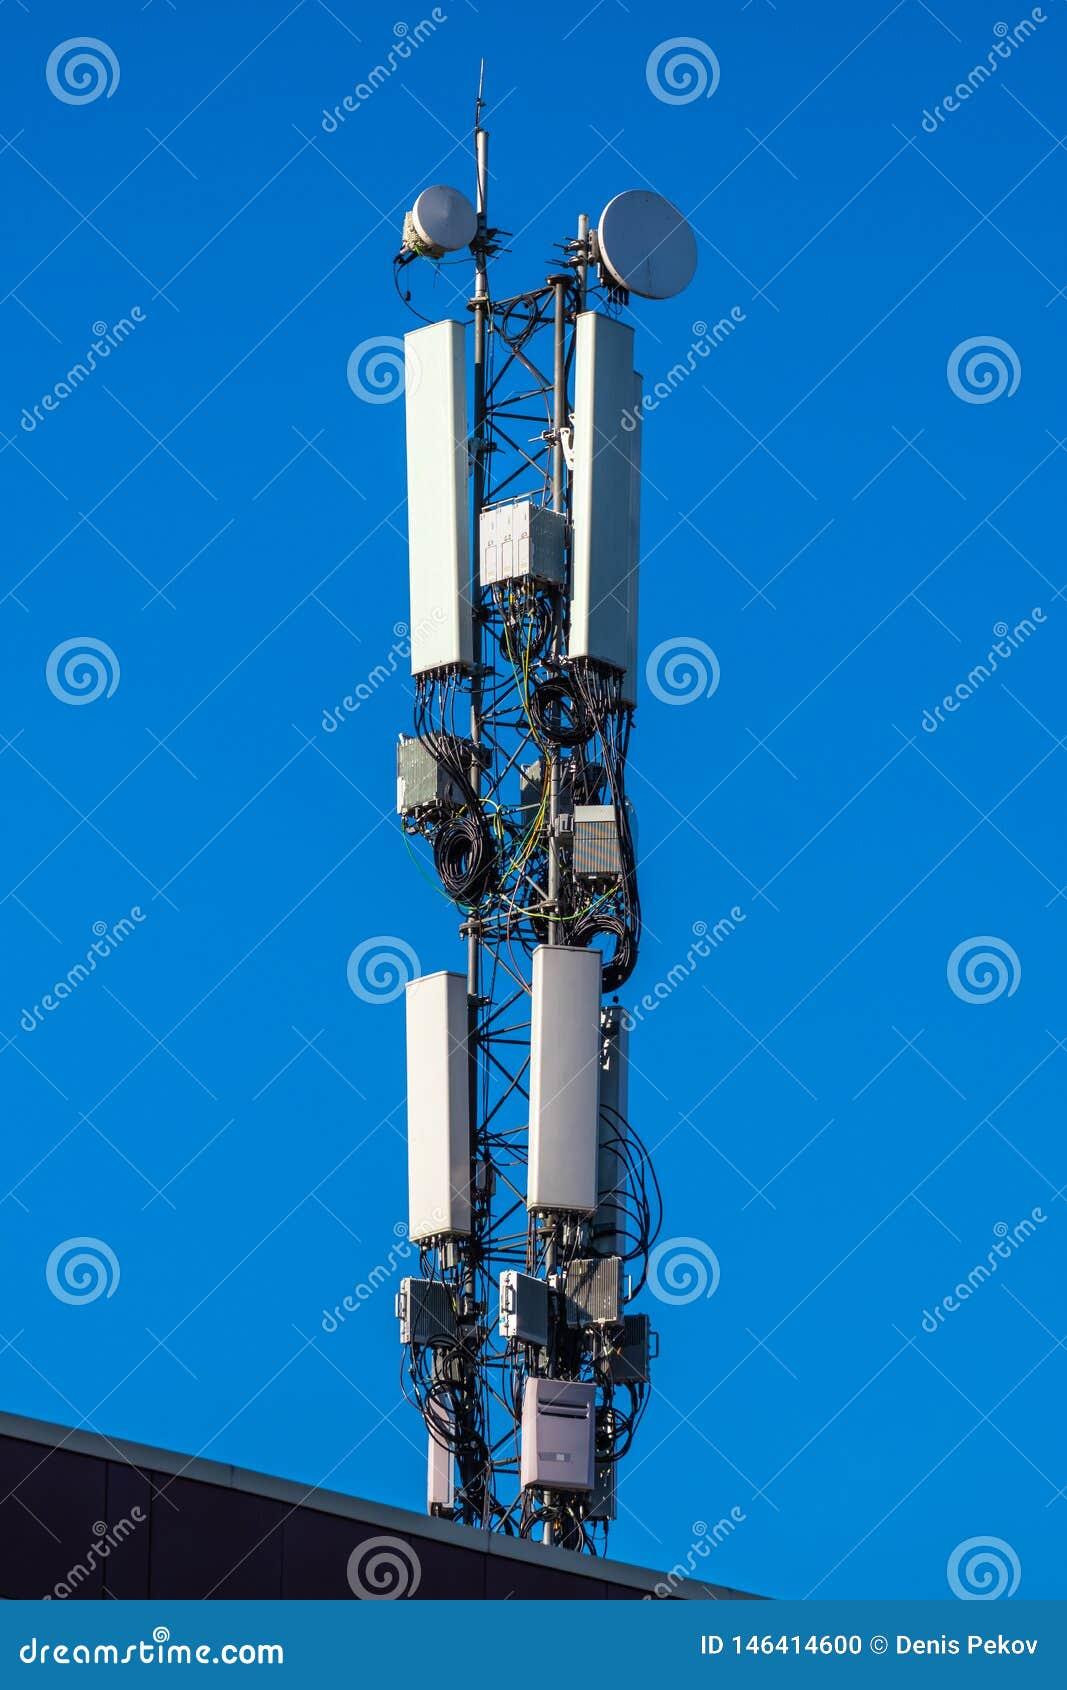 communication antenna against sky